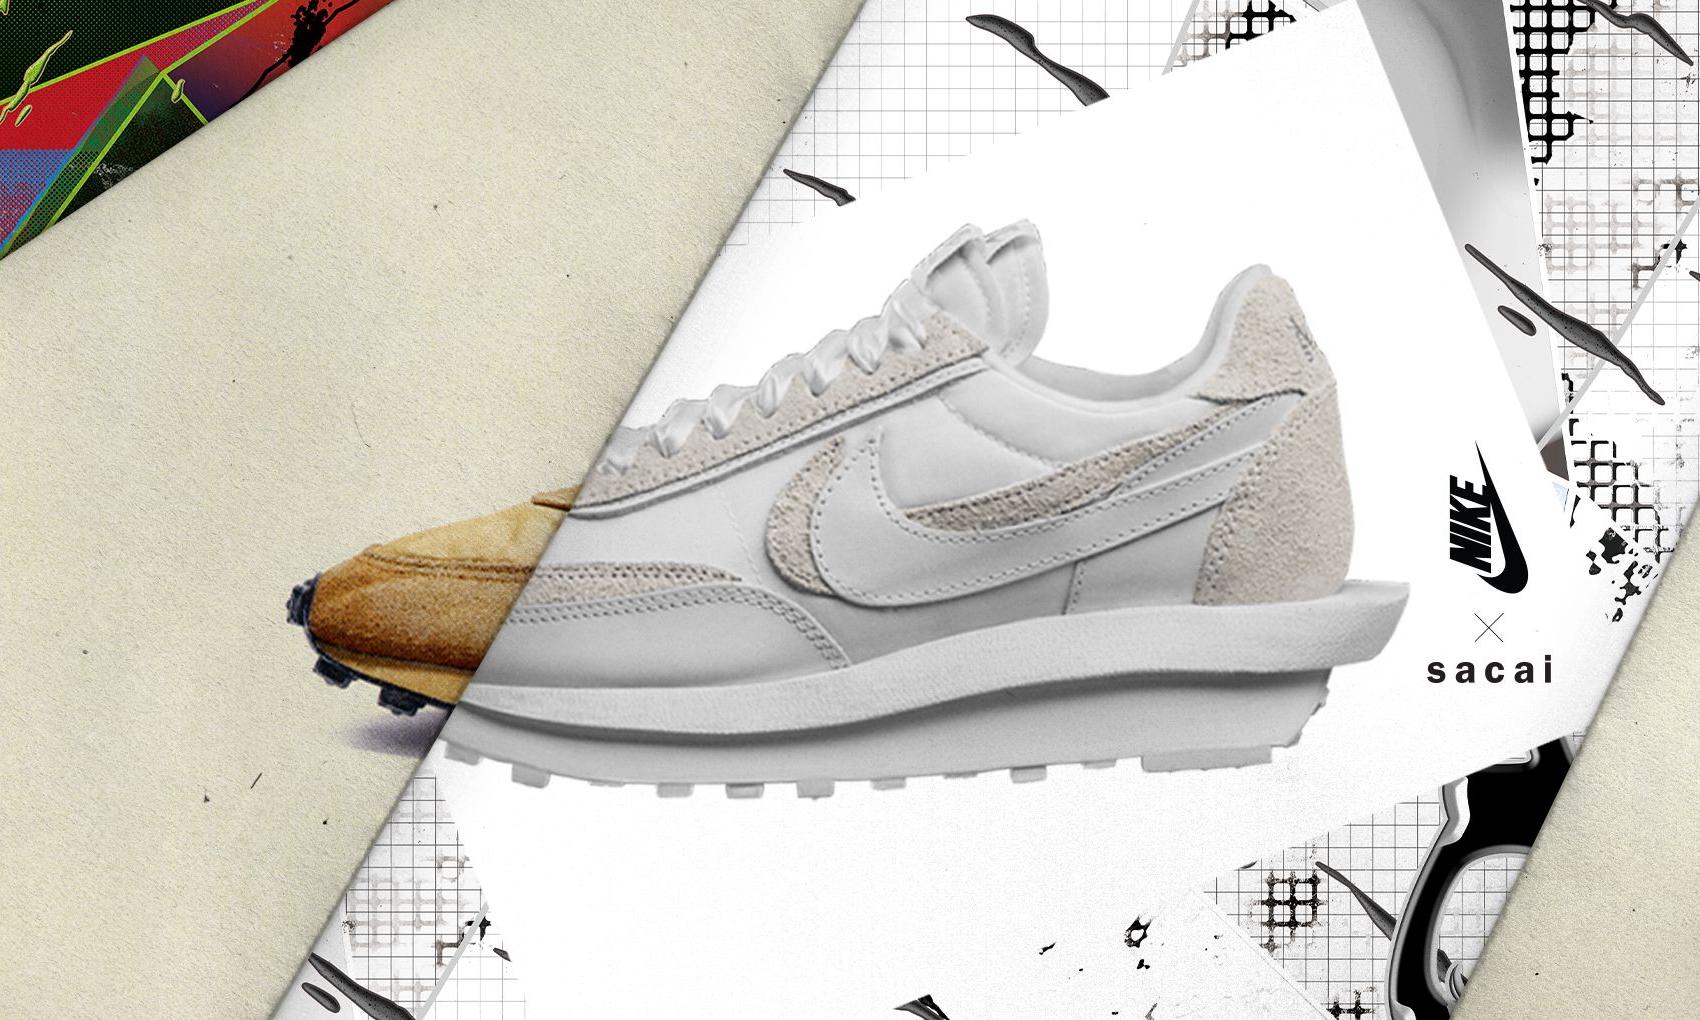 Nike x sacai LDWaffle 2020 新配色补货信息公开